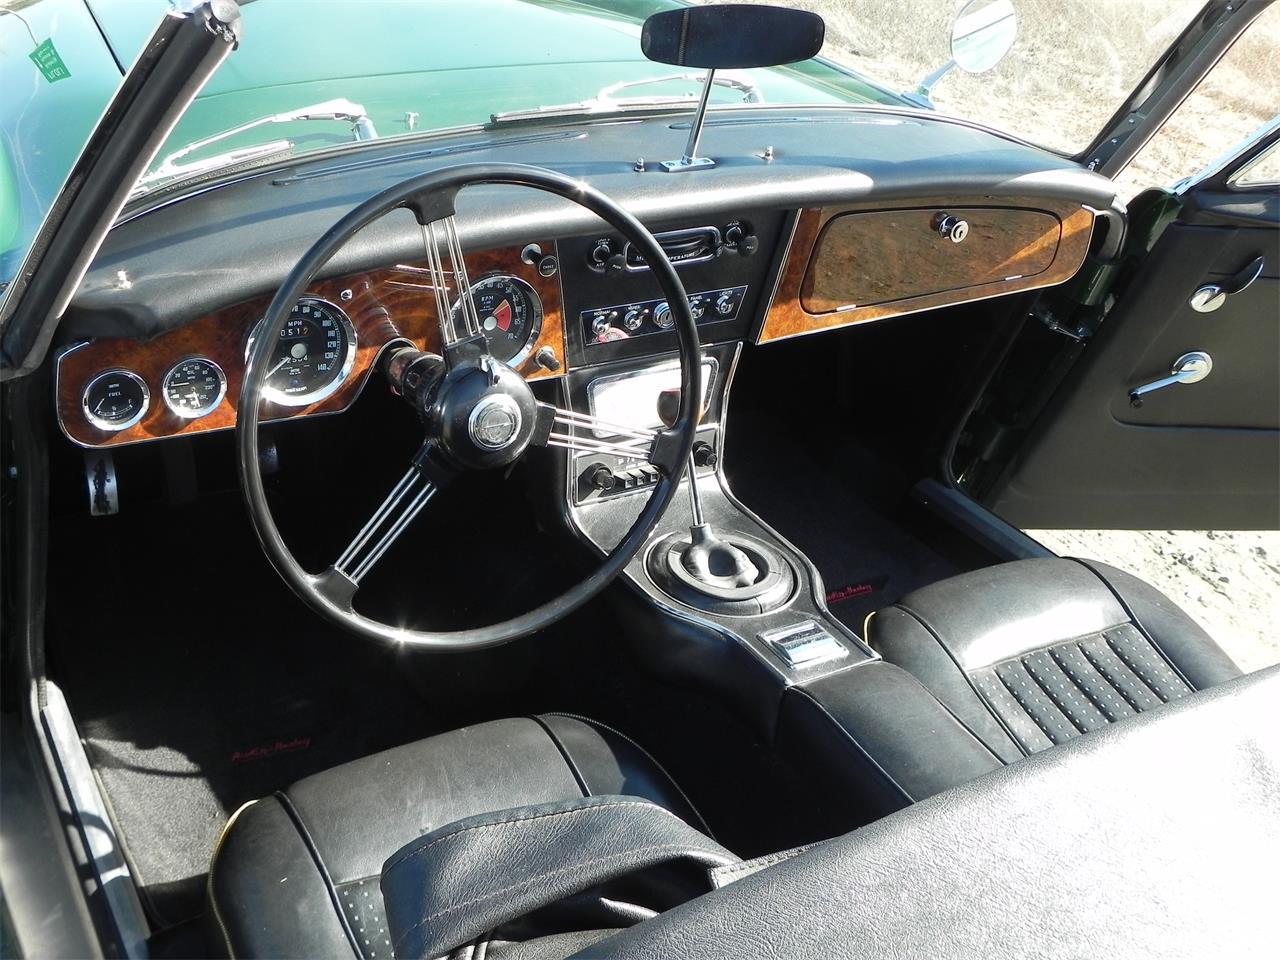 1967 Austin-Healey 3000 Mark III BJ8 (CC-1413605) for sale in Redwood City, California